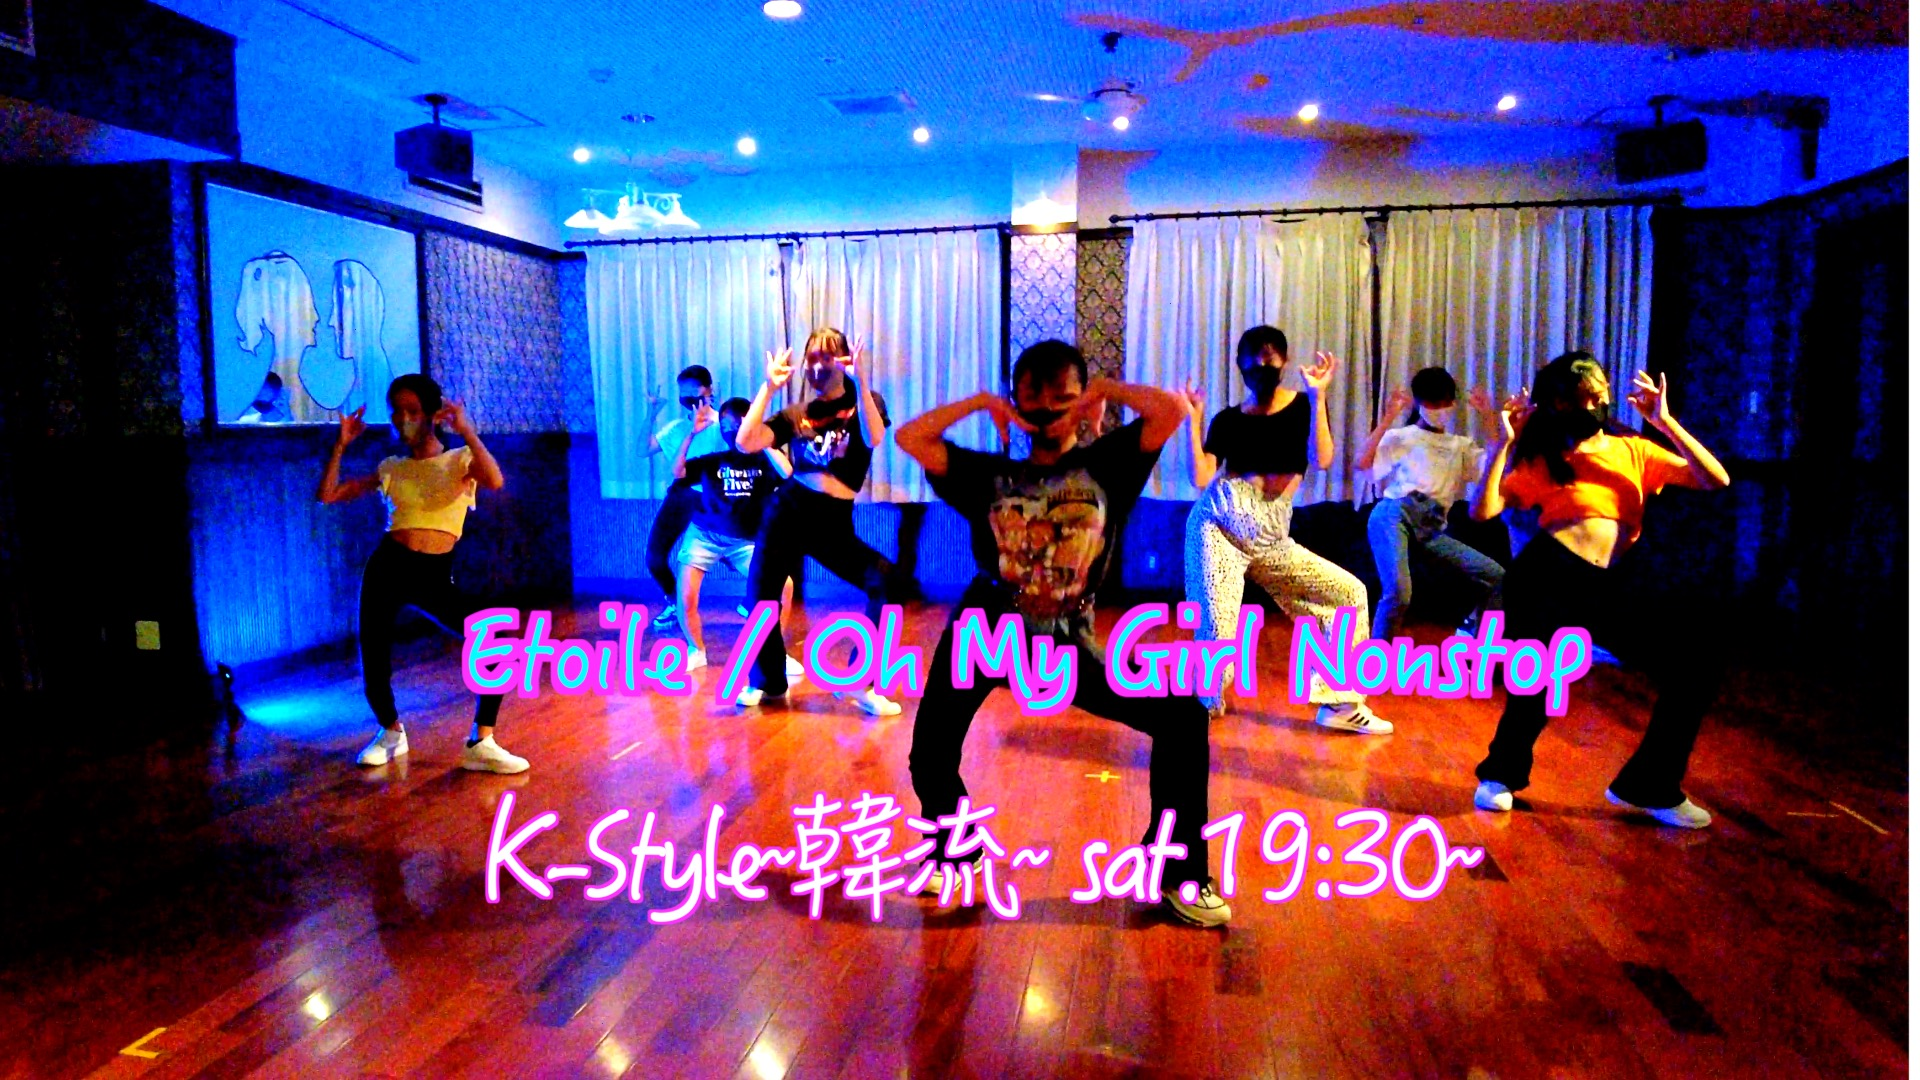 K-Popダンス【Etoile/Oh My Girl】